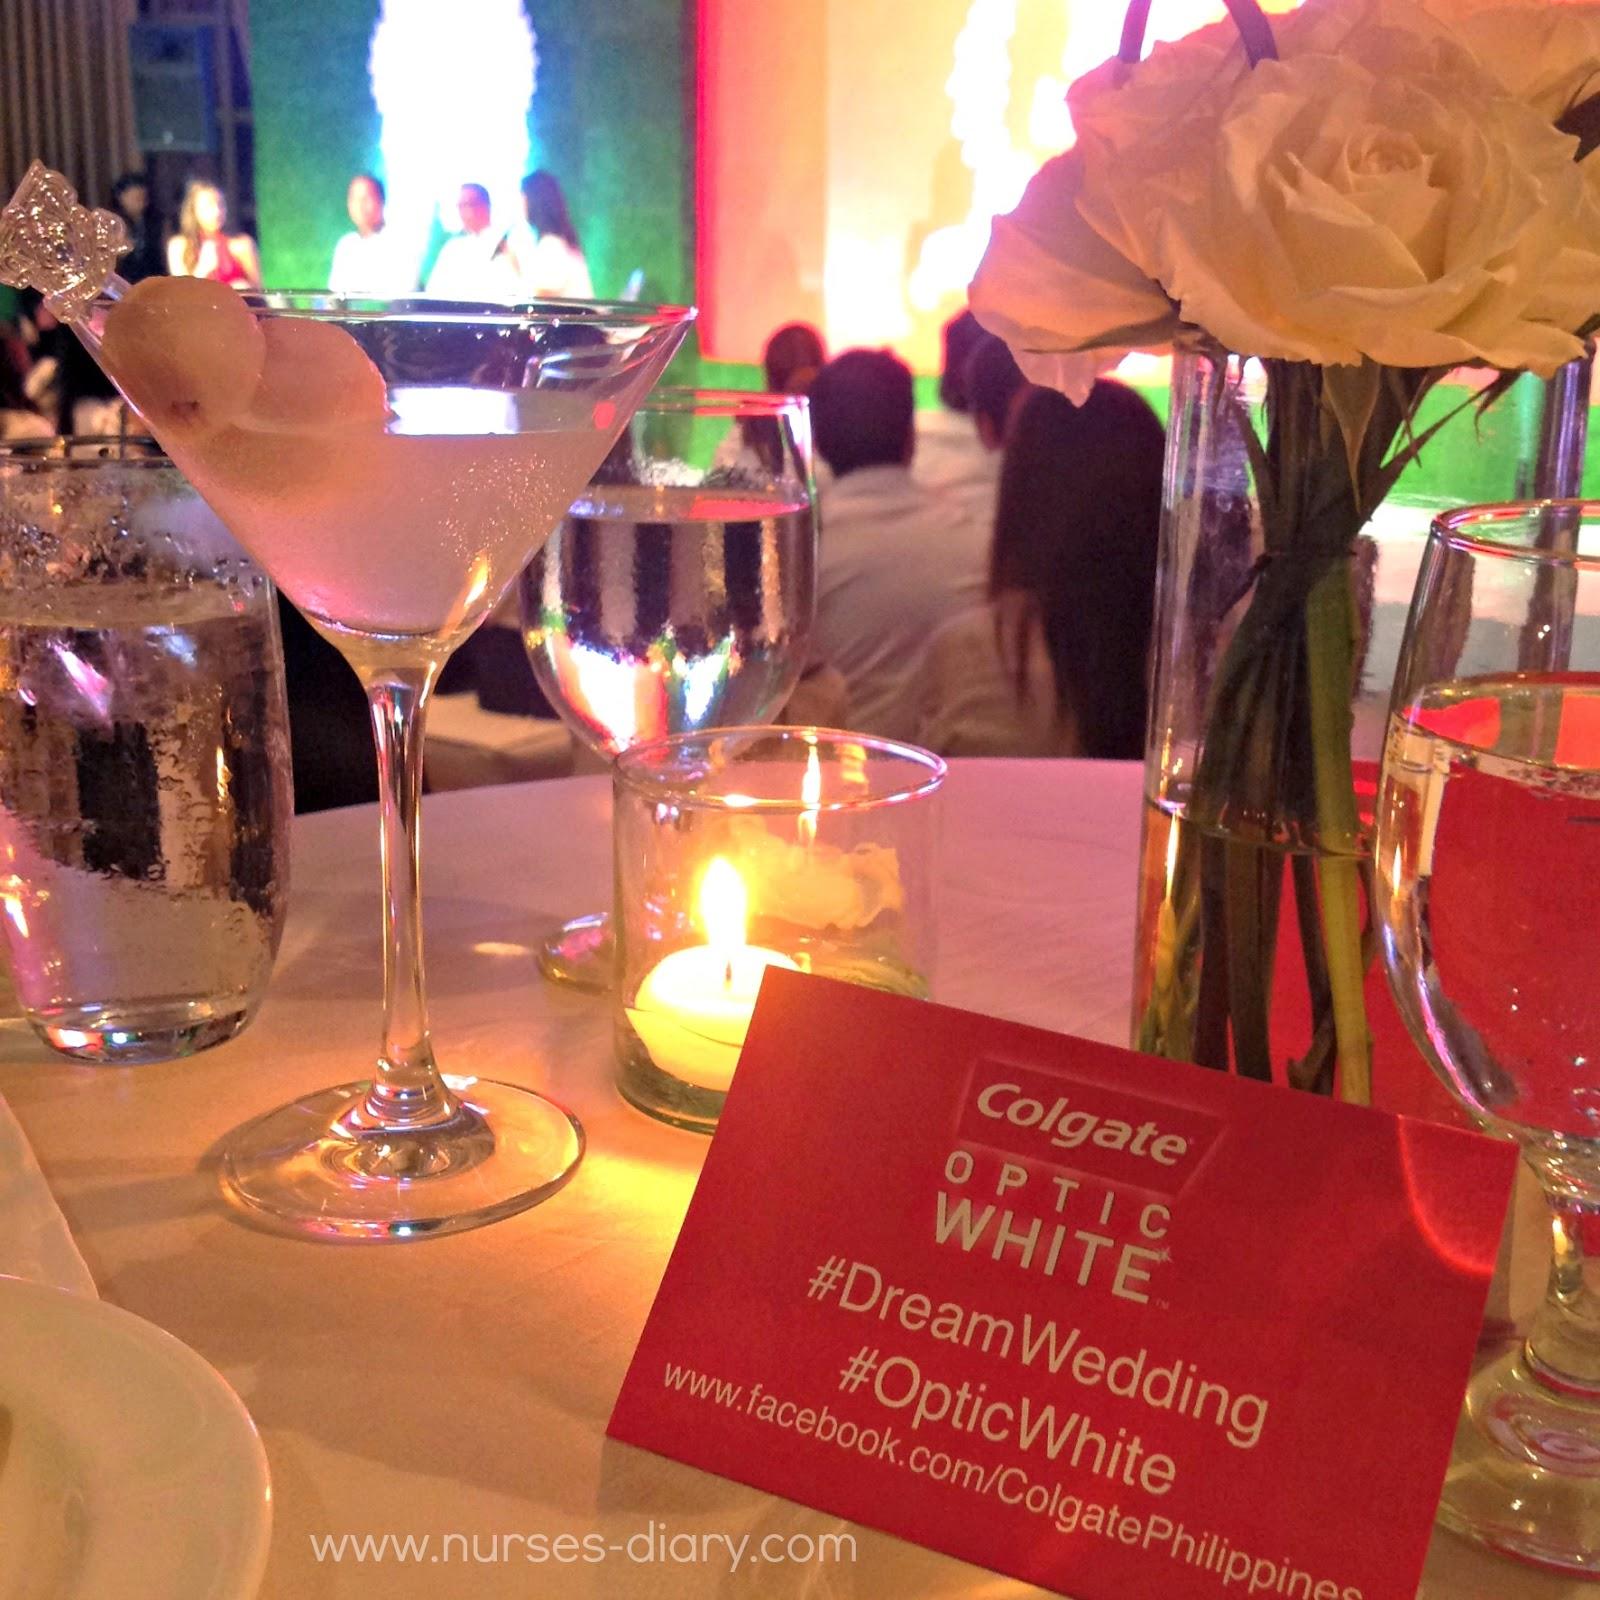 Colgate Optic White's Dream Wedding Launch